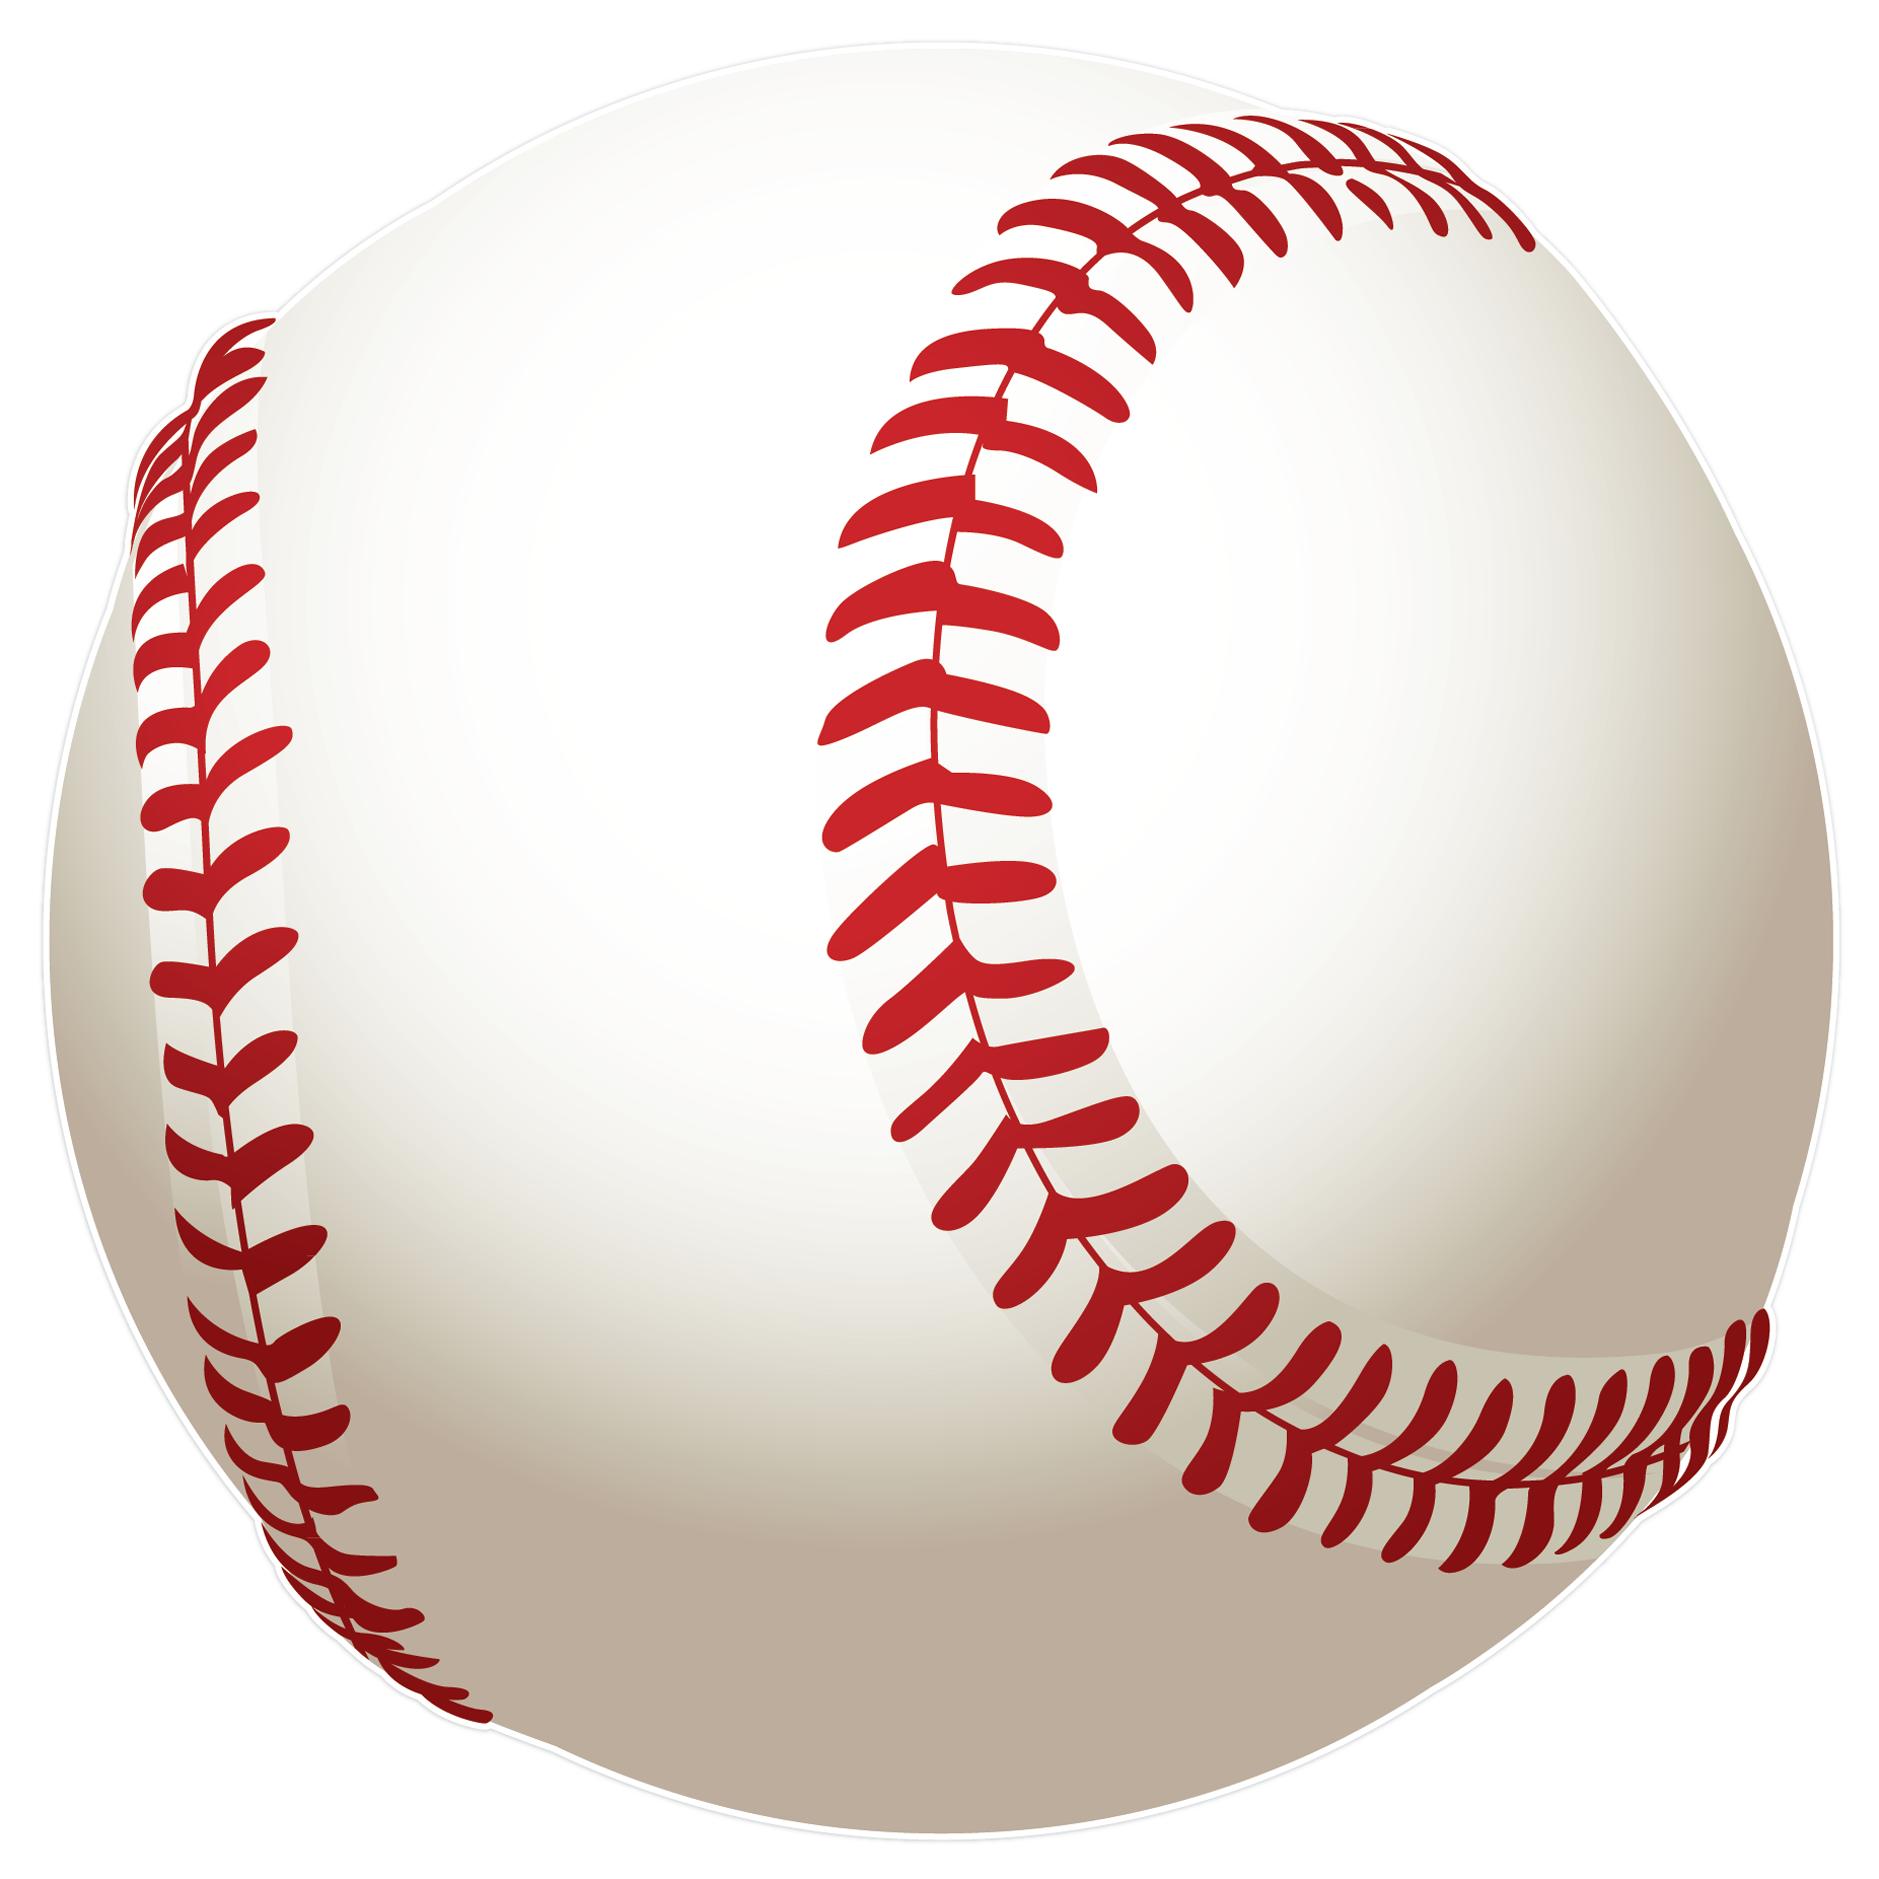 Baseball Png image #35358 - Baseball PNG